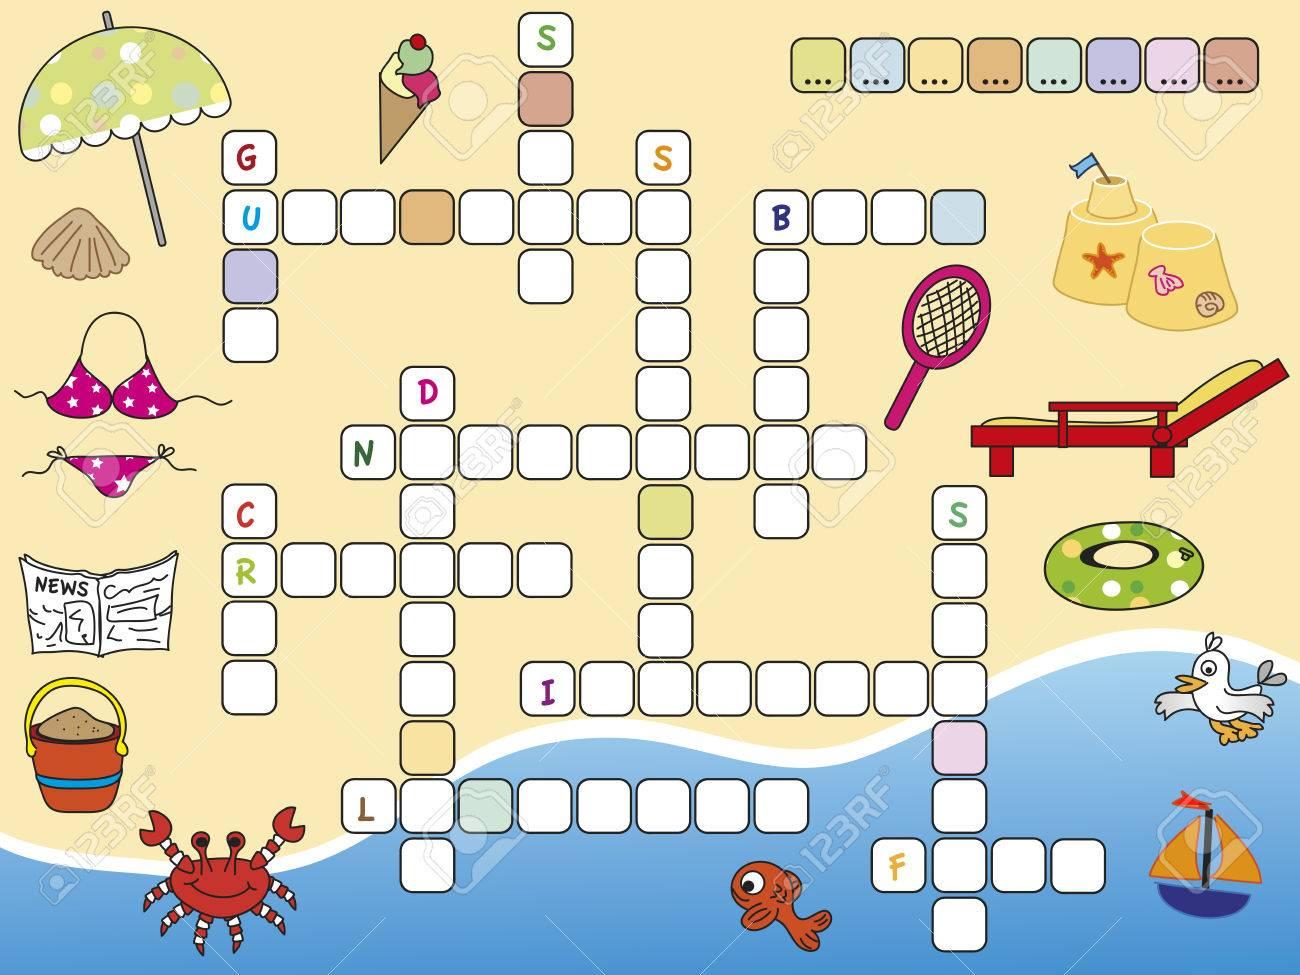 Game For Children Crossword concernant Mot Pour Enfant